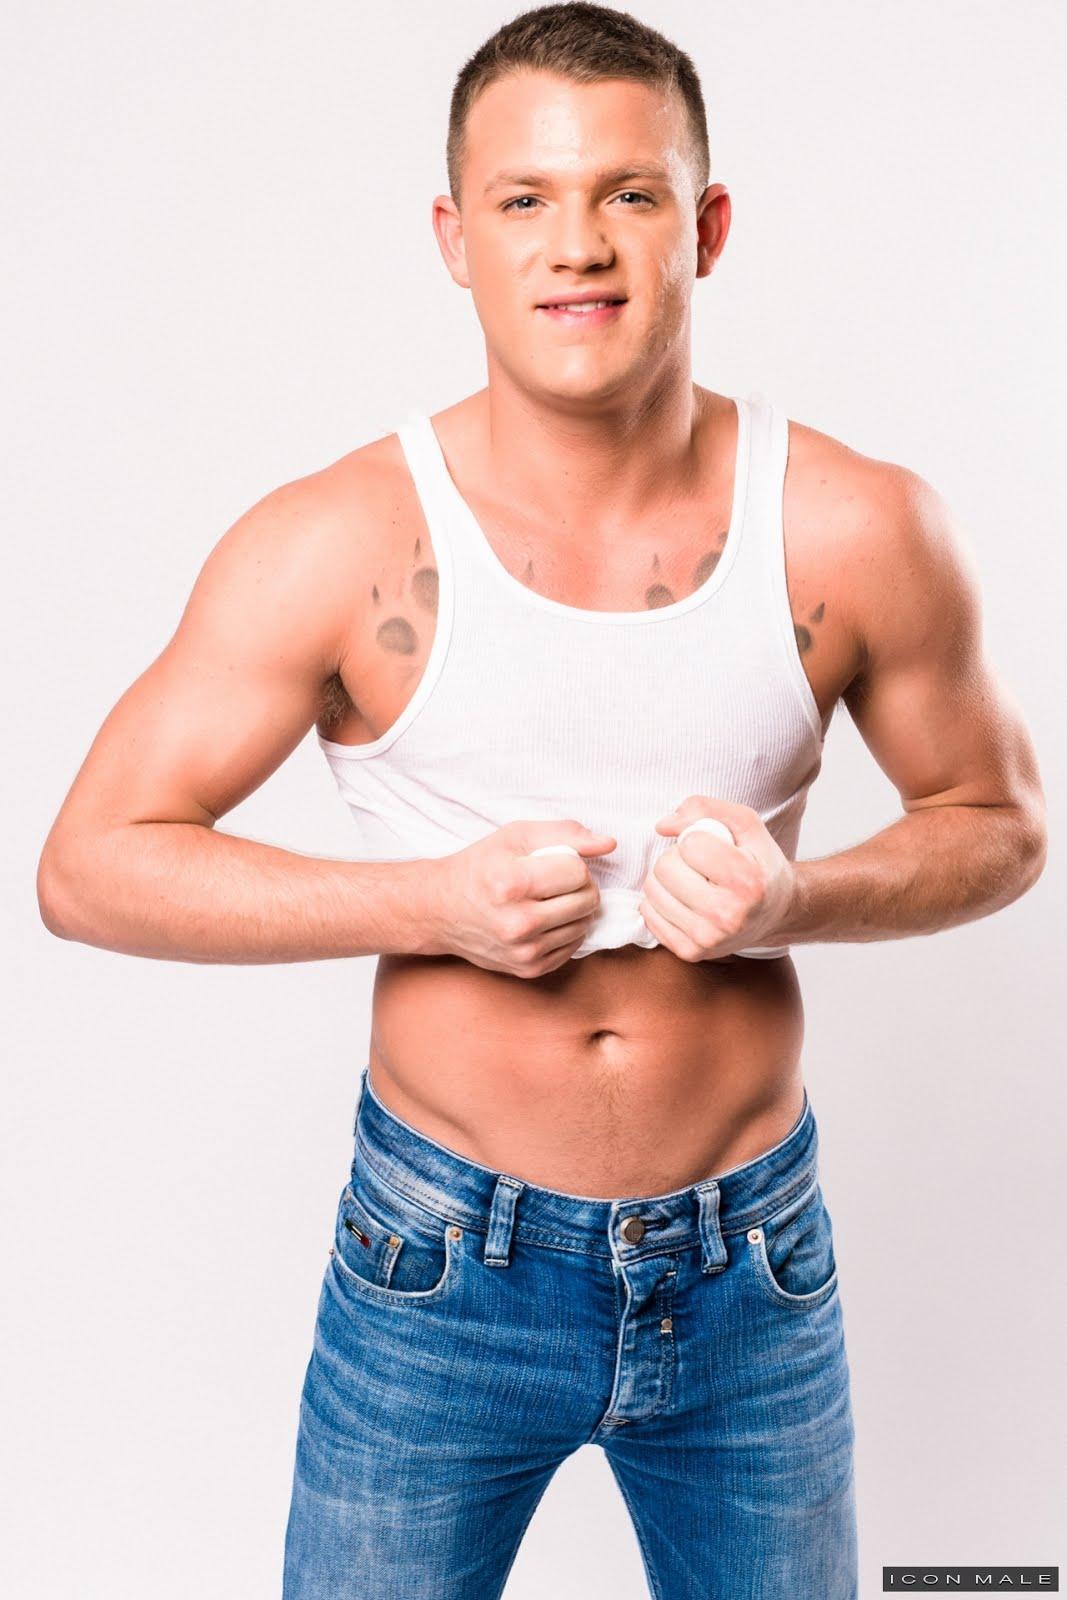 Hall of Hot Men: ICON MALE: Brandon Wilde